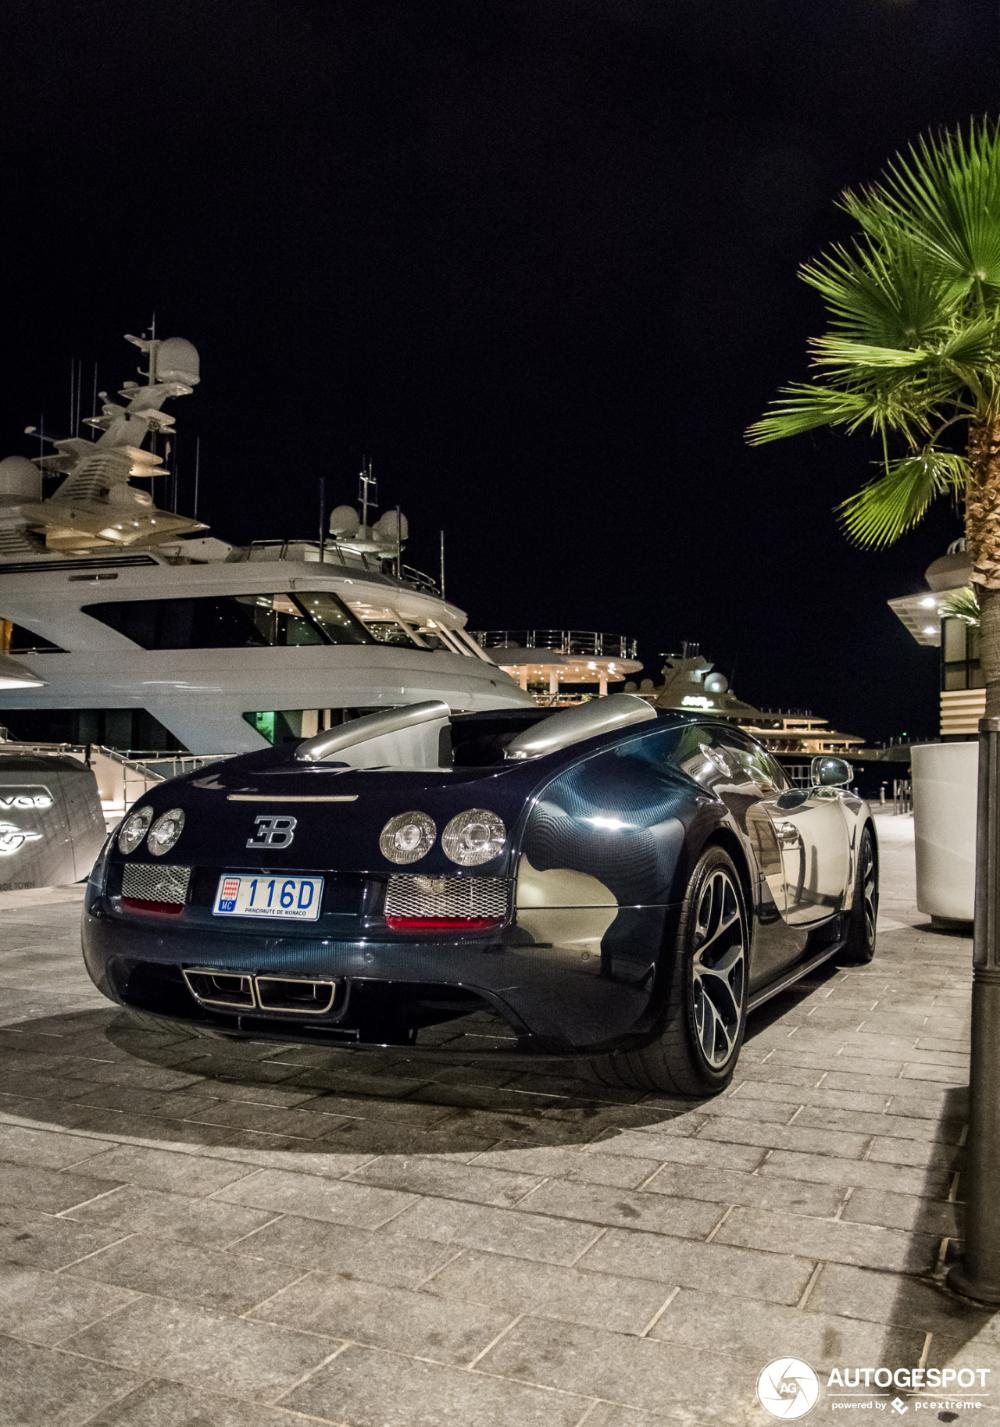 Bugatti Veyron 16 4 Grand Sport Bugatti Veyron Bugatti Superauto